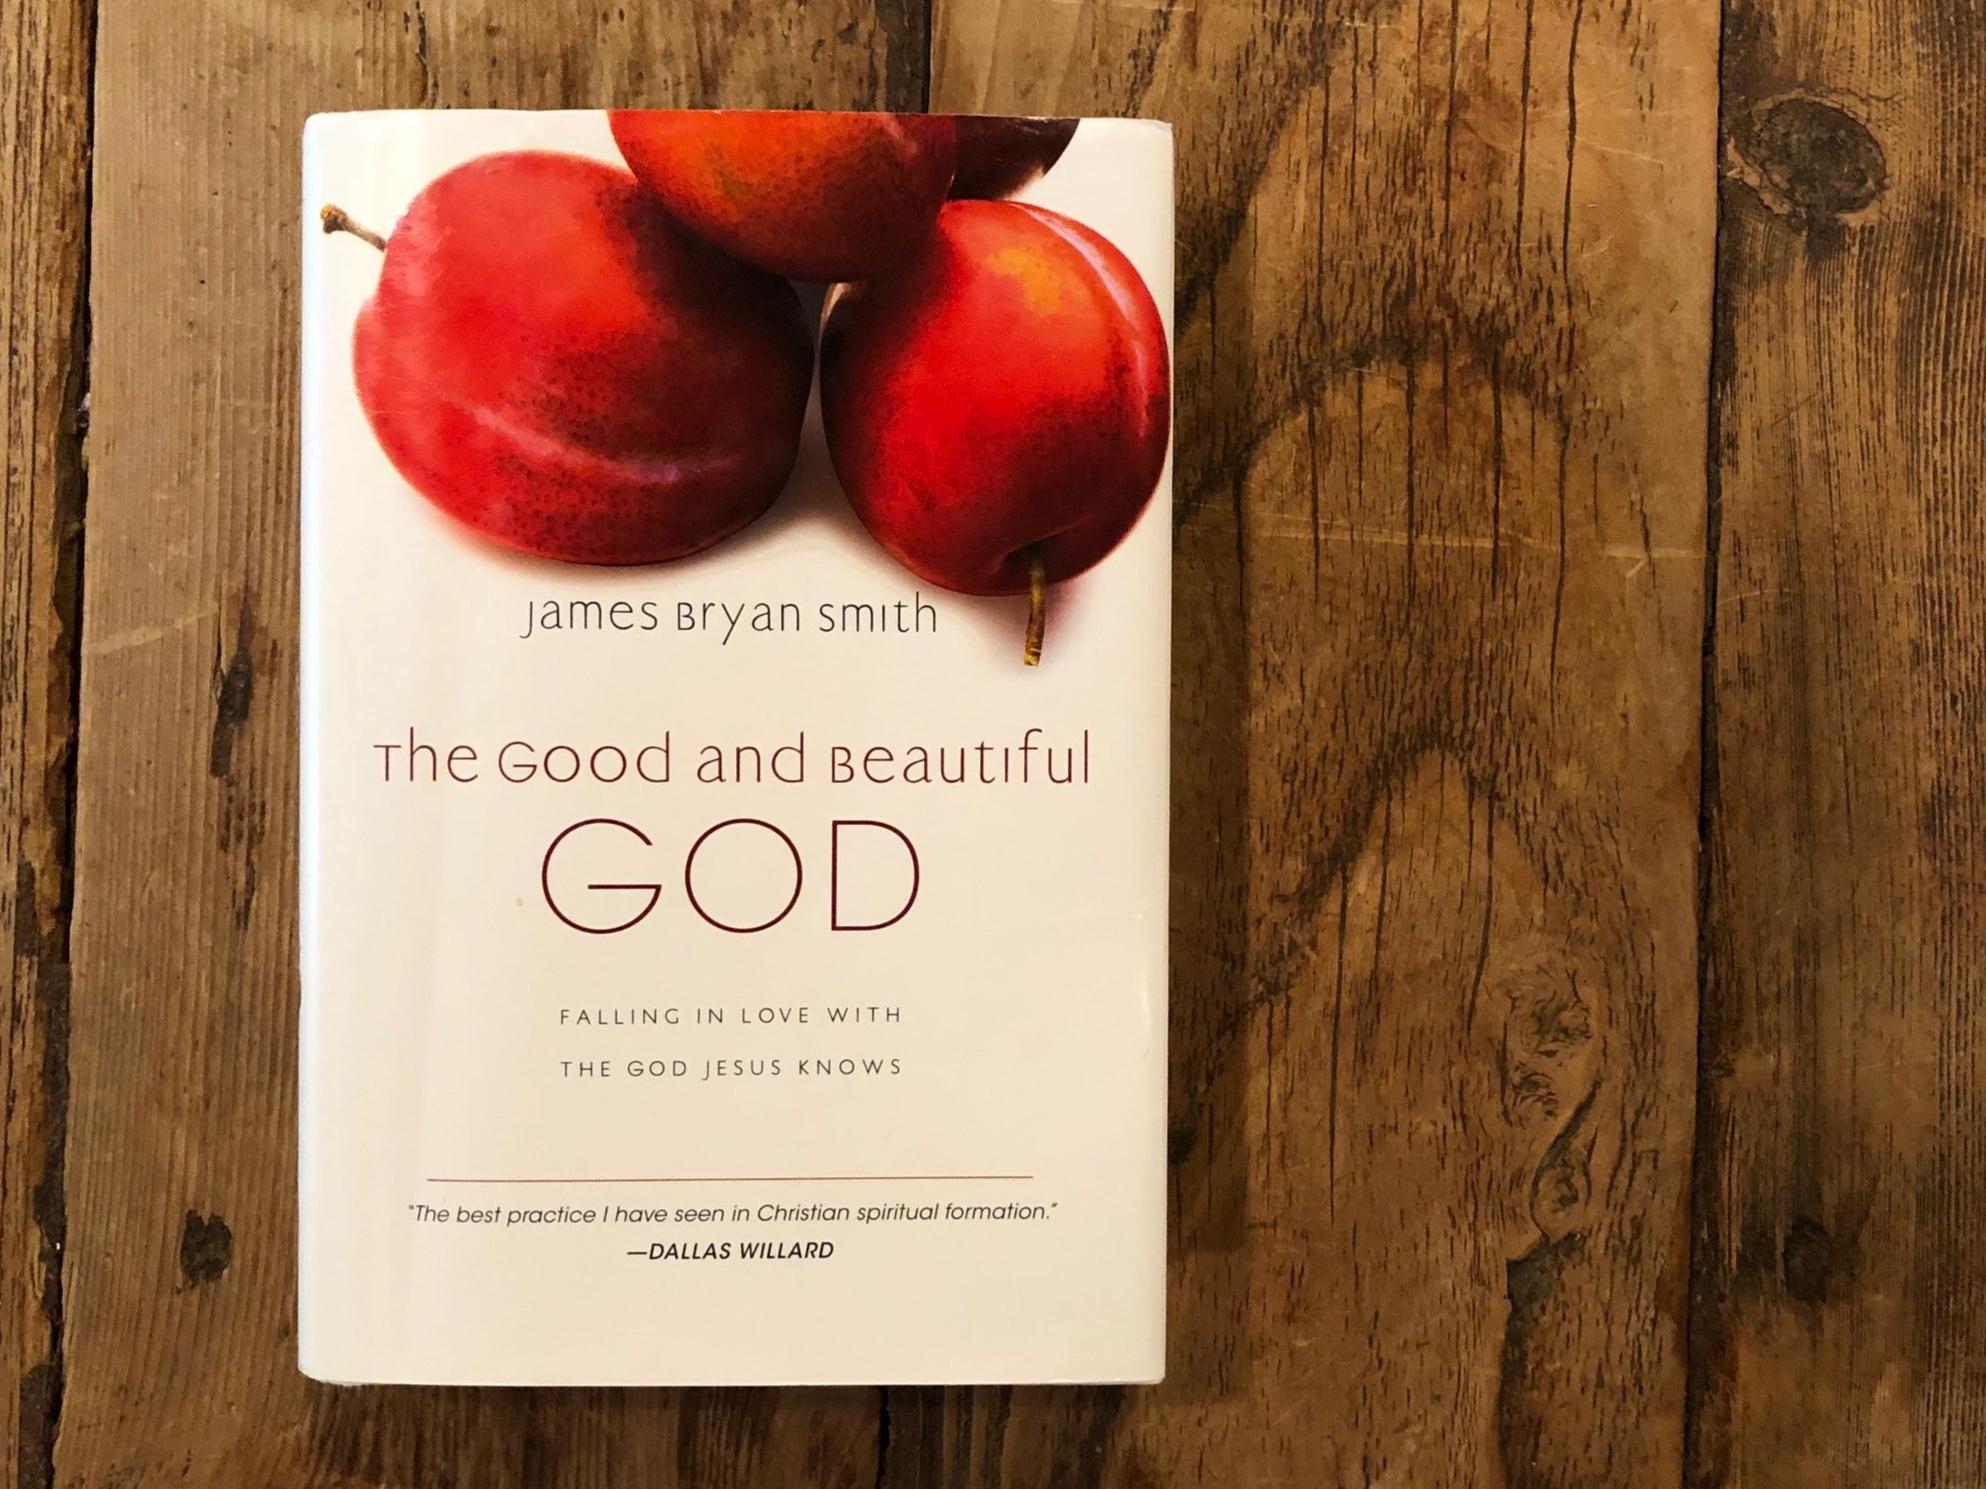 Good+and+Beautiful+God.jpg